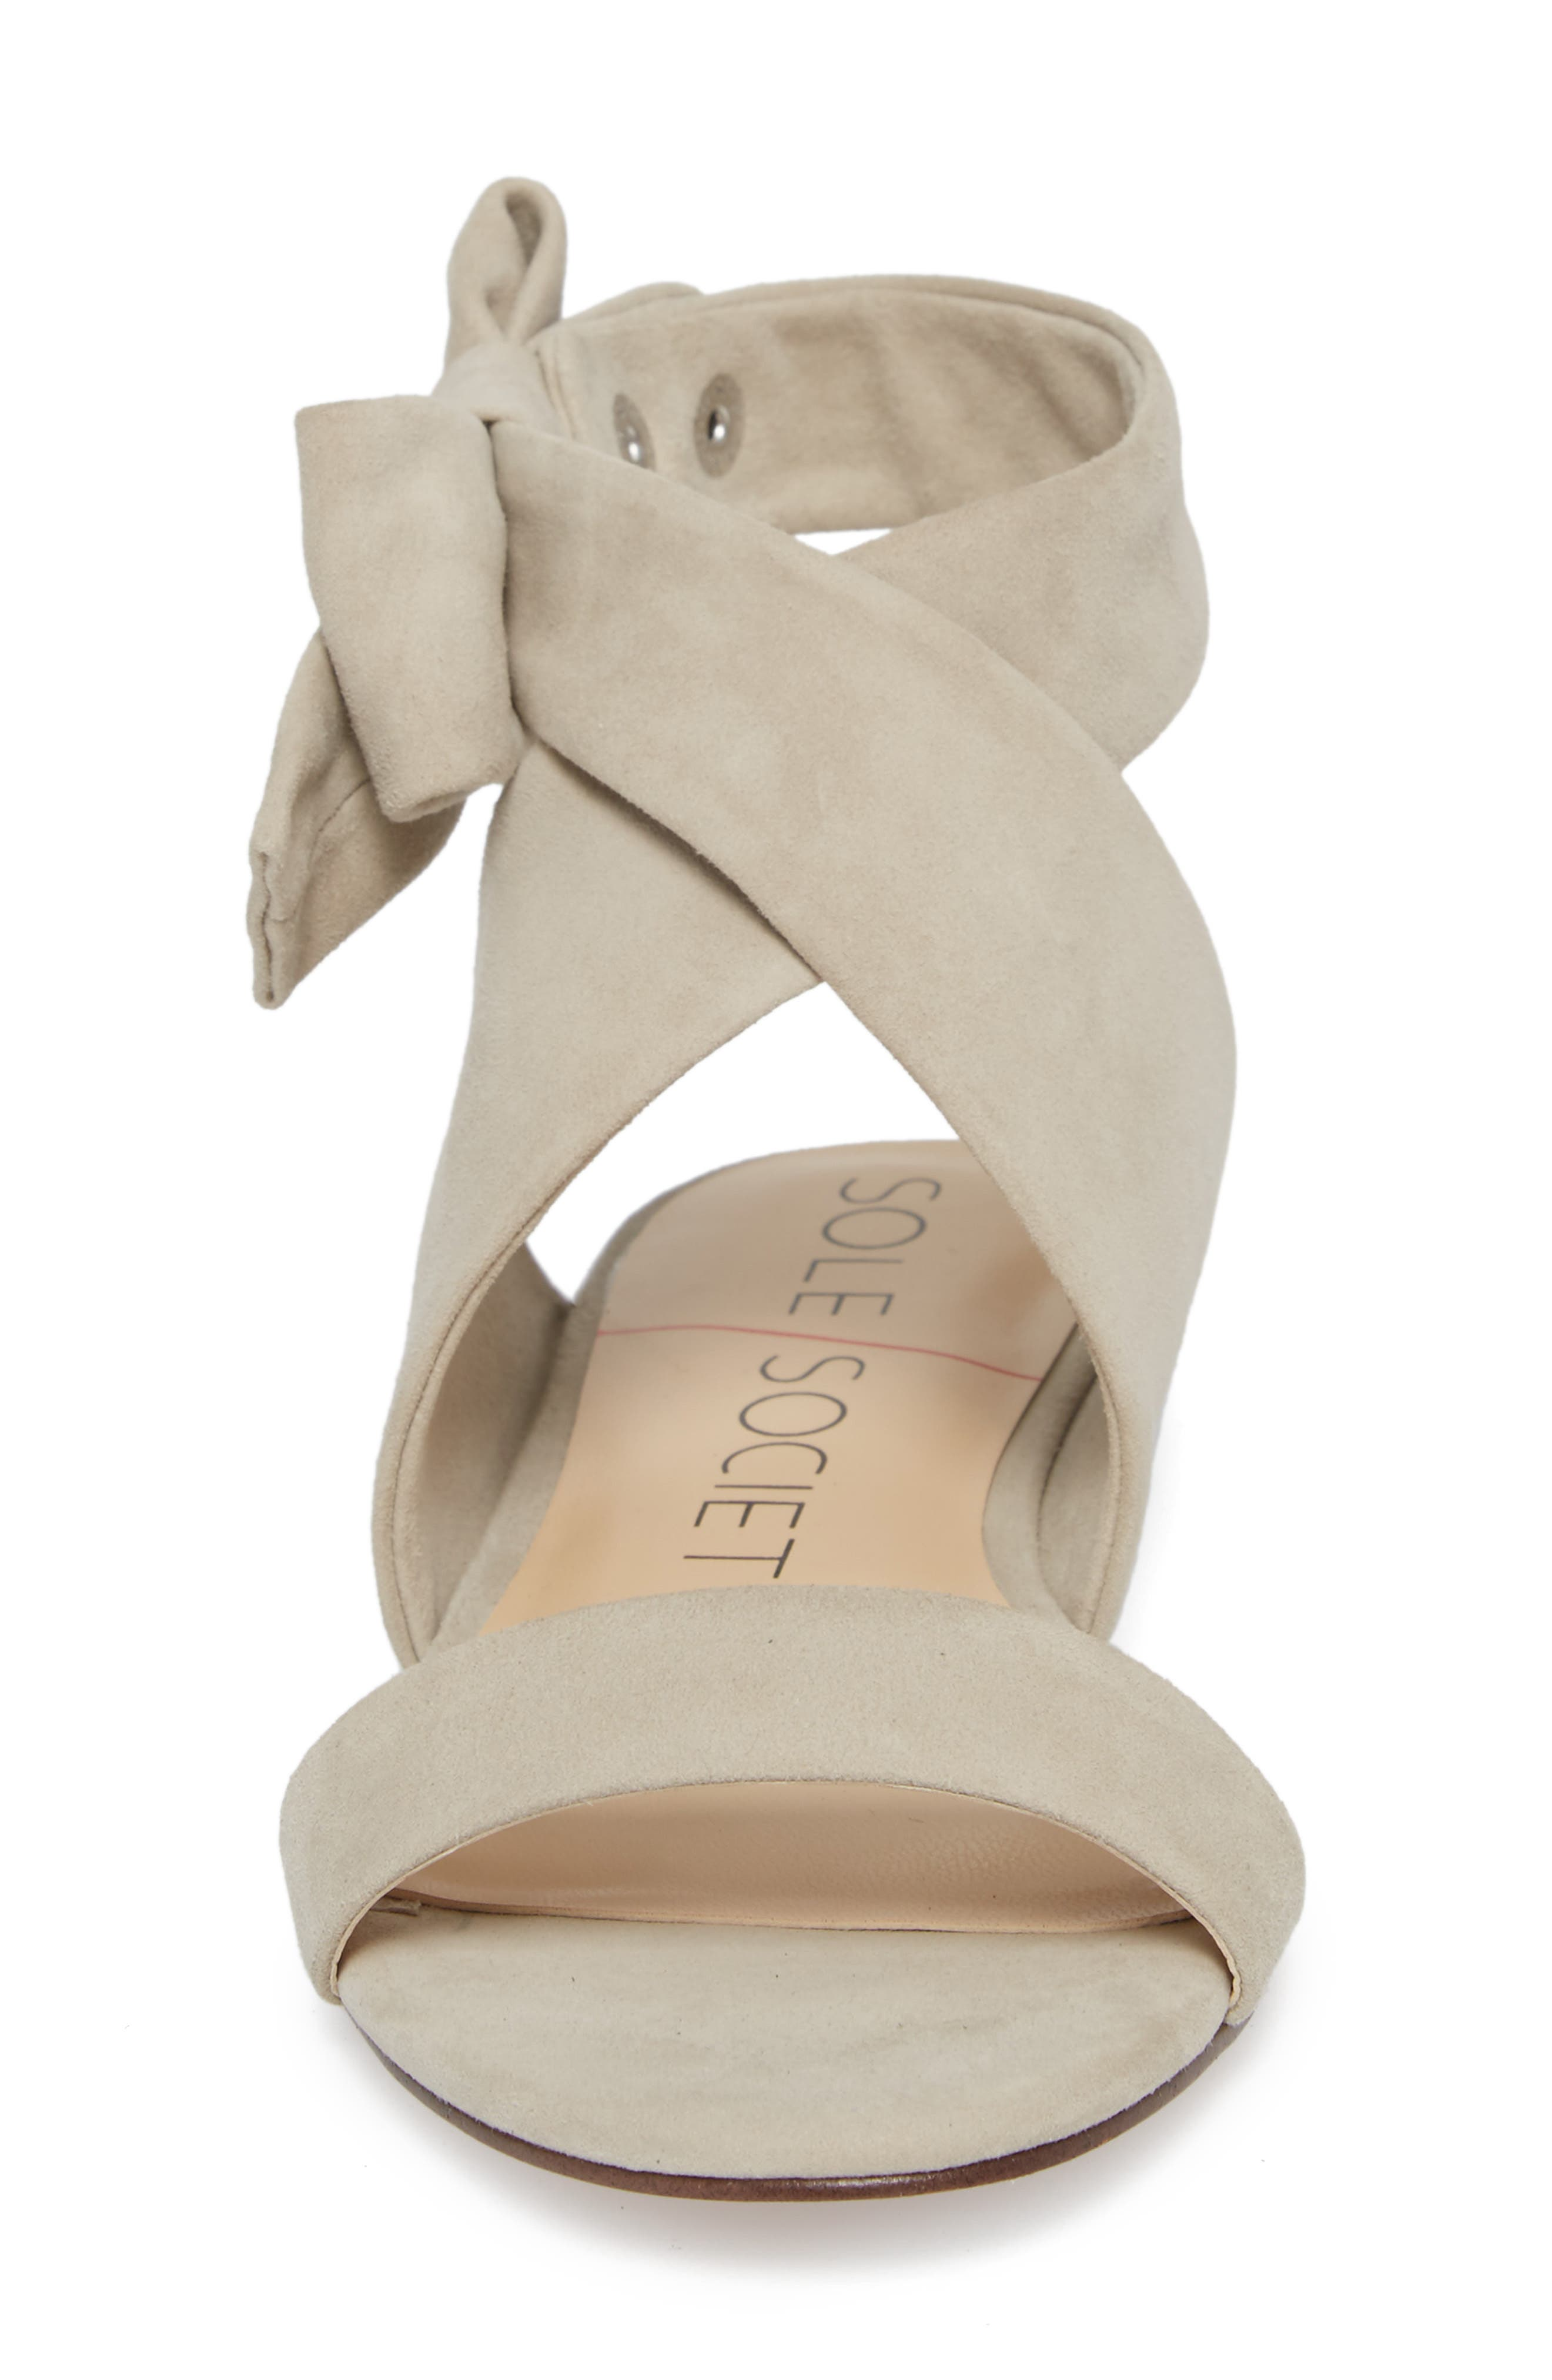 Calynda Bow Ankle Wrap Sandal,                             Alternate thumbnail 4, color,                             020